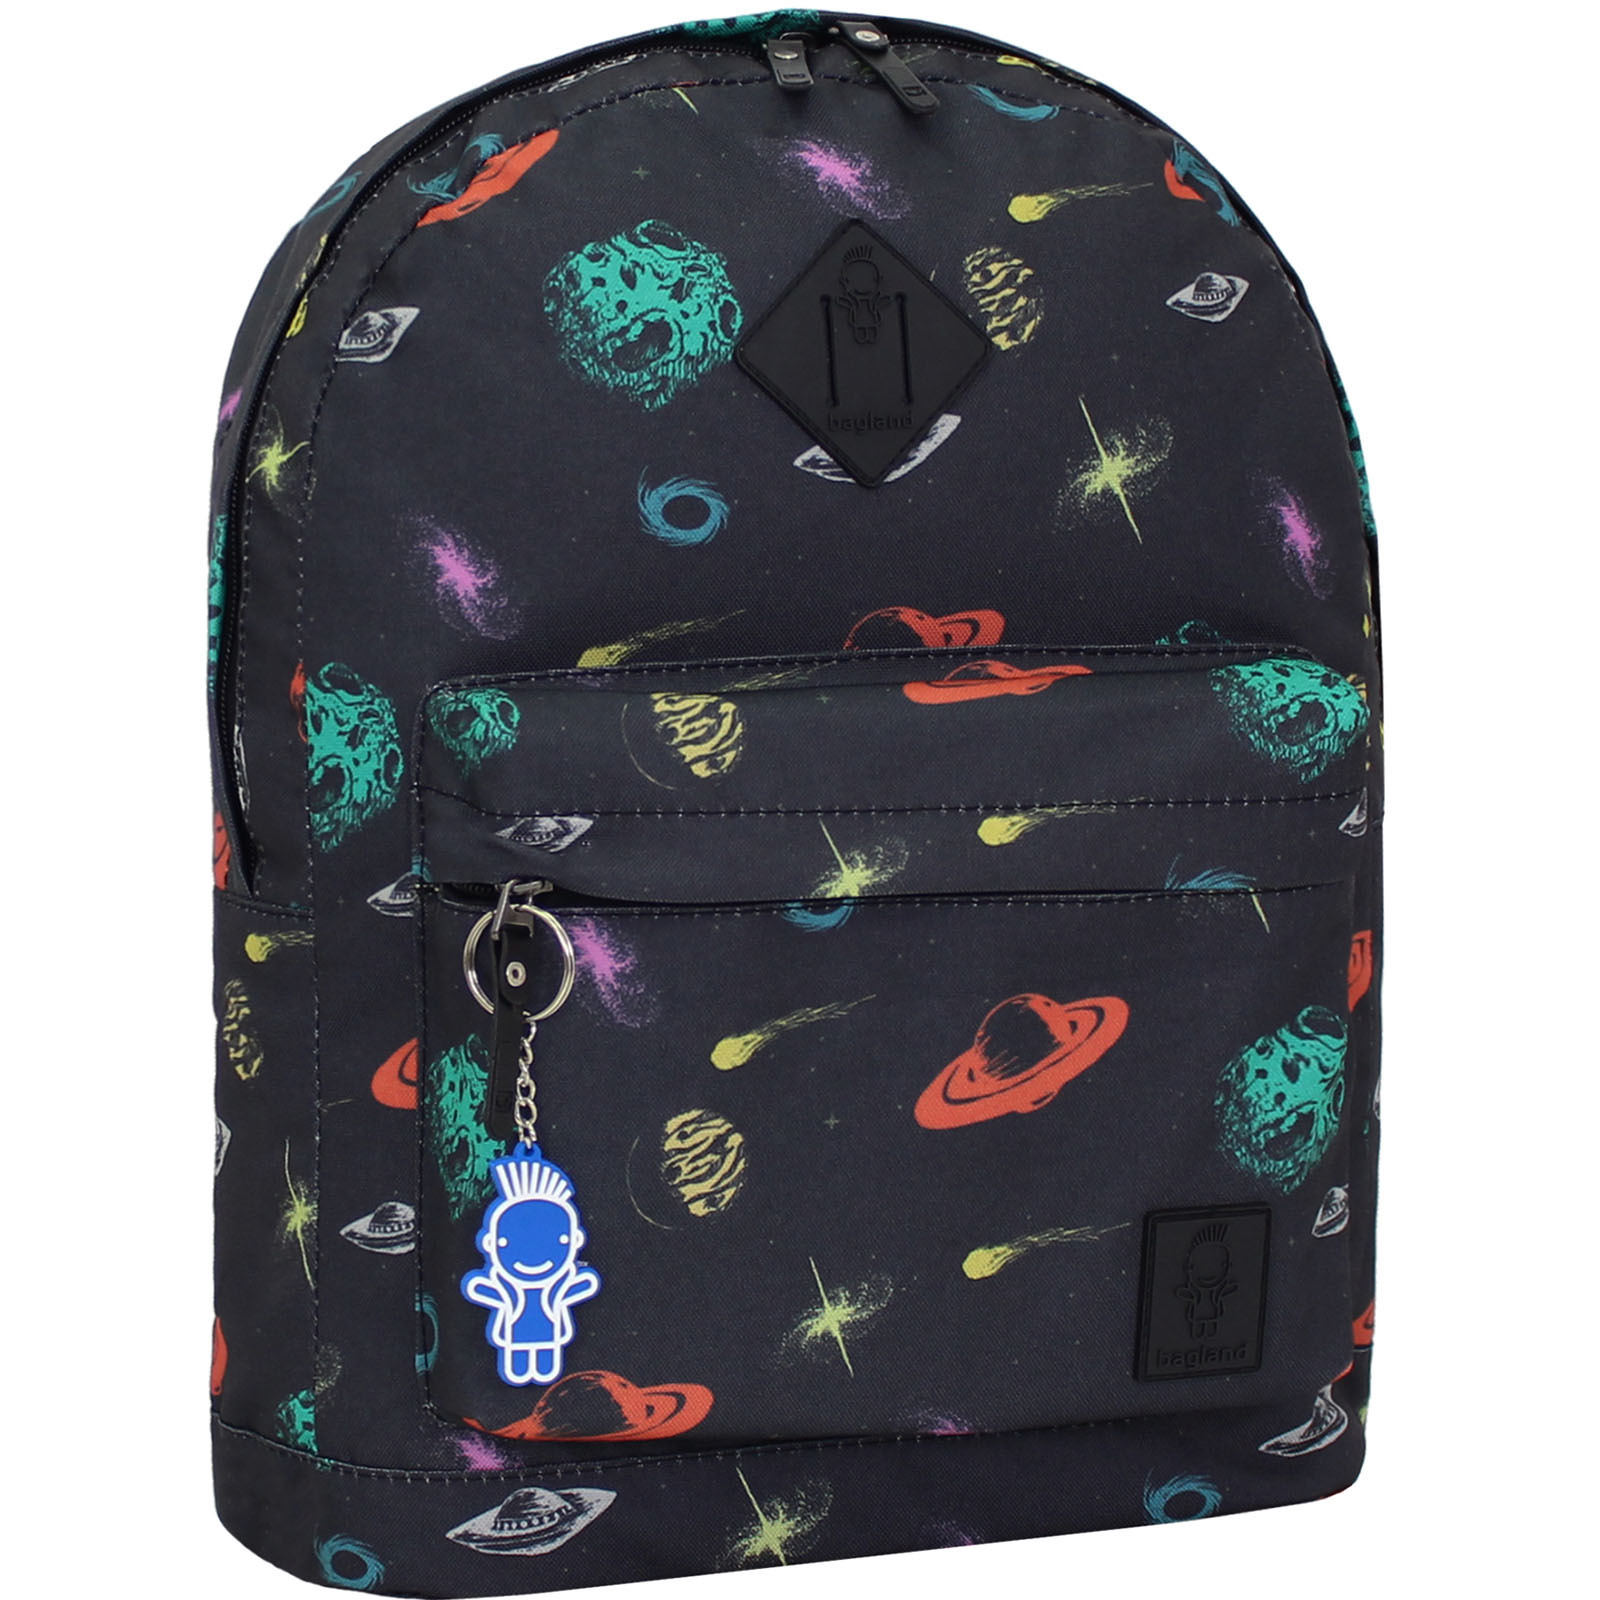 Городские рюкзаки Рюкзак Bagland Молодежный (дизайн) 17 л. сублимация 215 (00533664) IMG_1180_215.JPG